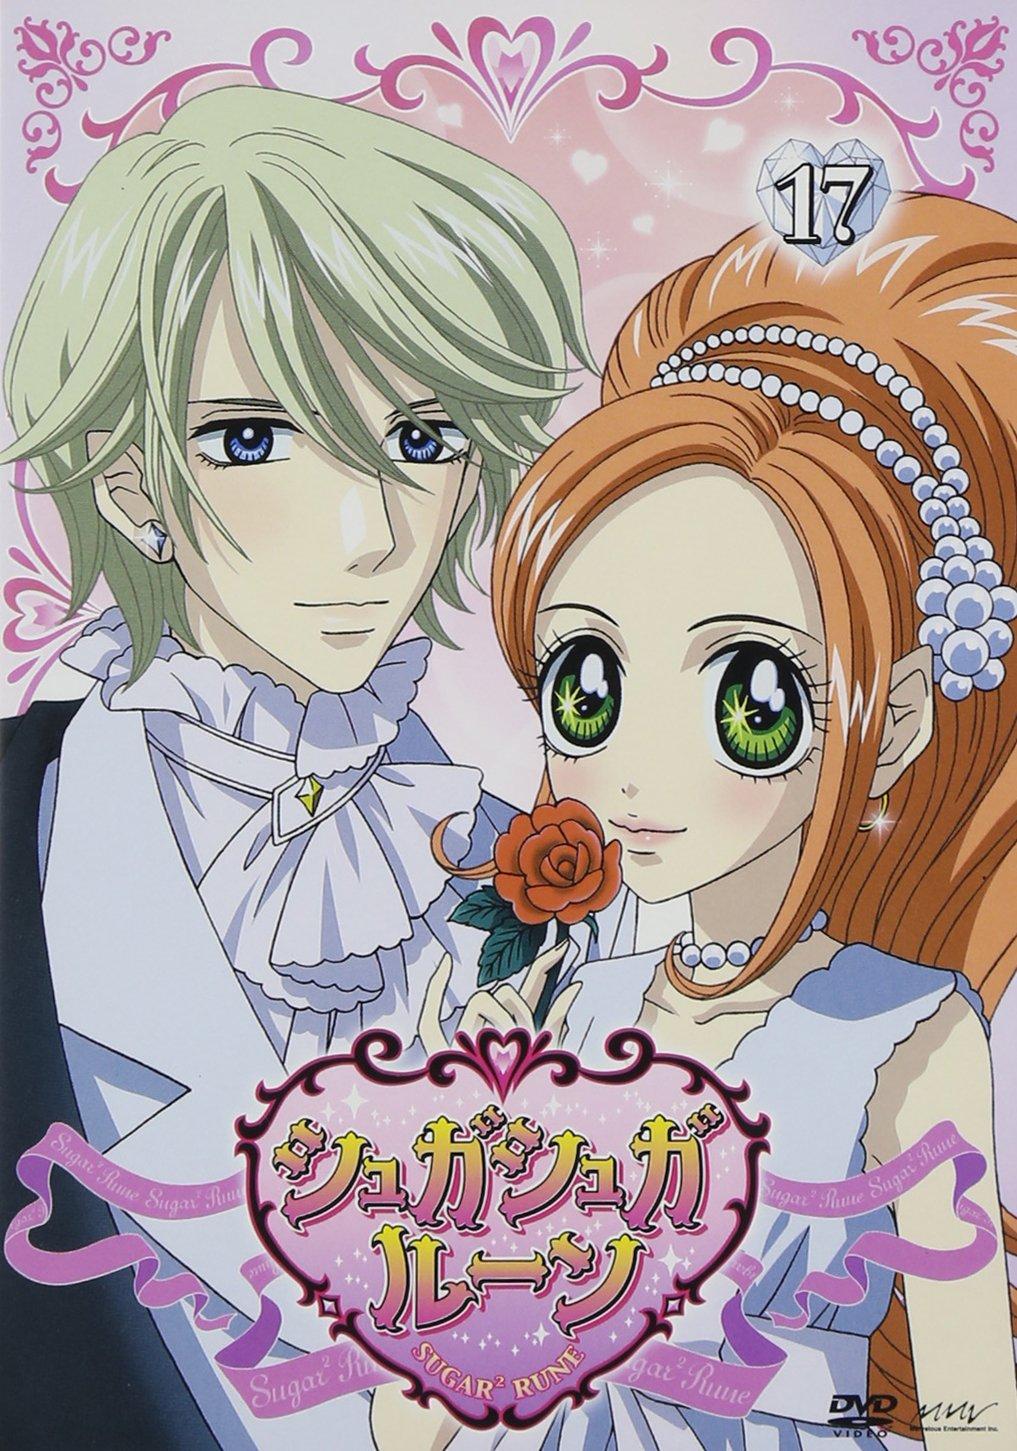 Pierre Tempête de Neige, Chocolat Meilleure / Kato, sugar sugar rune, anime, manga, moyoco anno, love story, romance